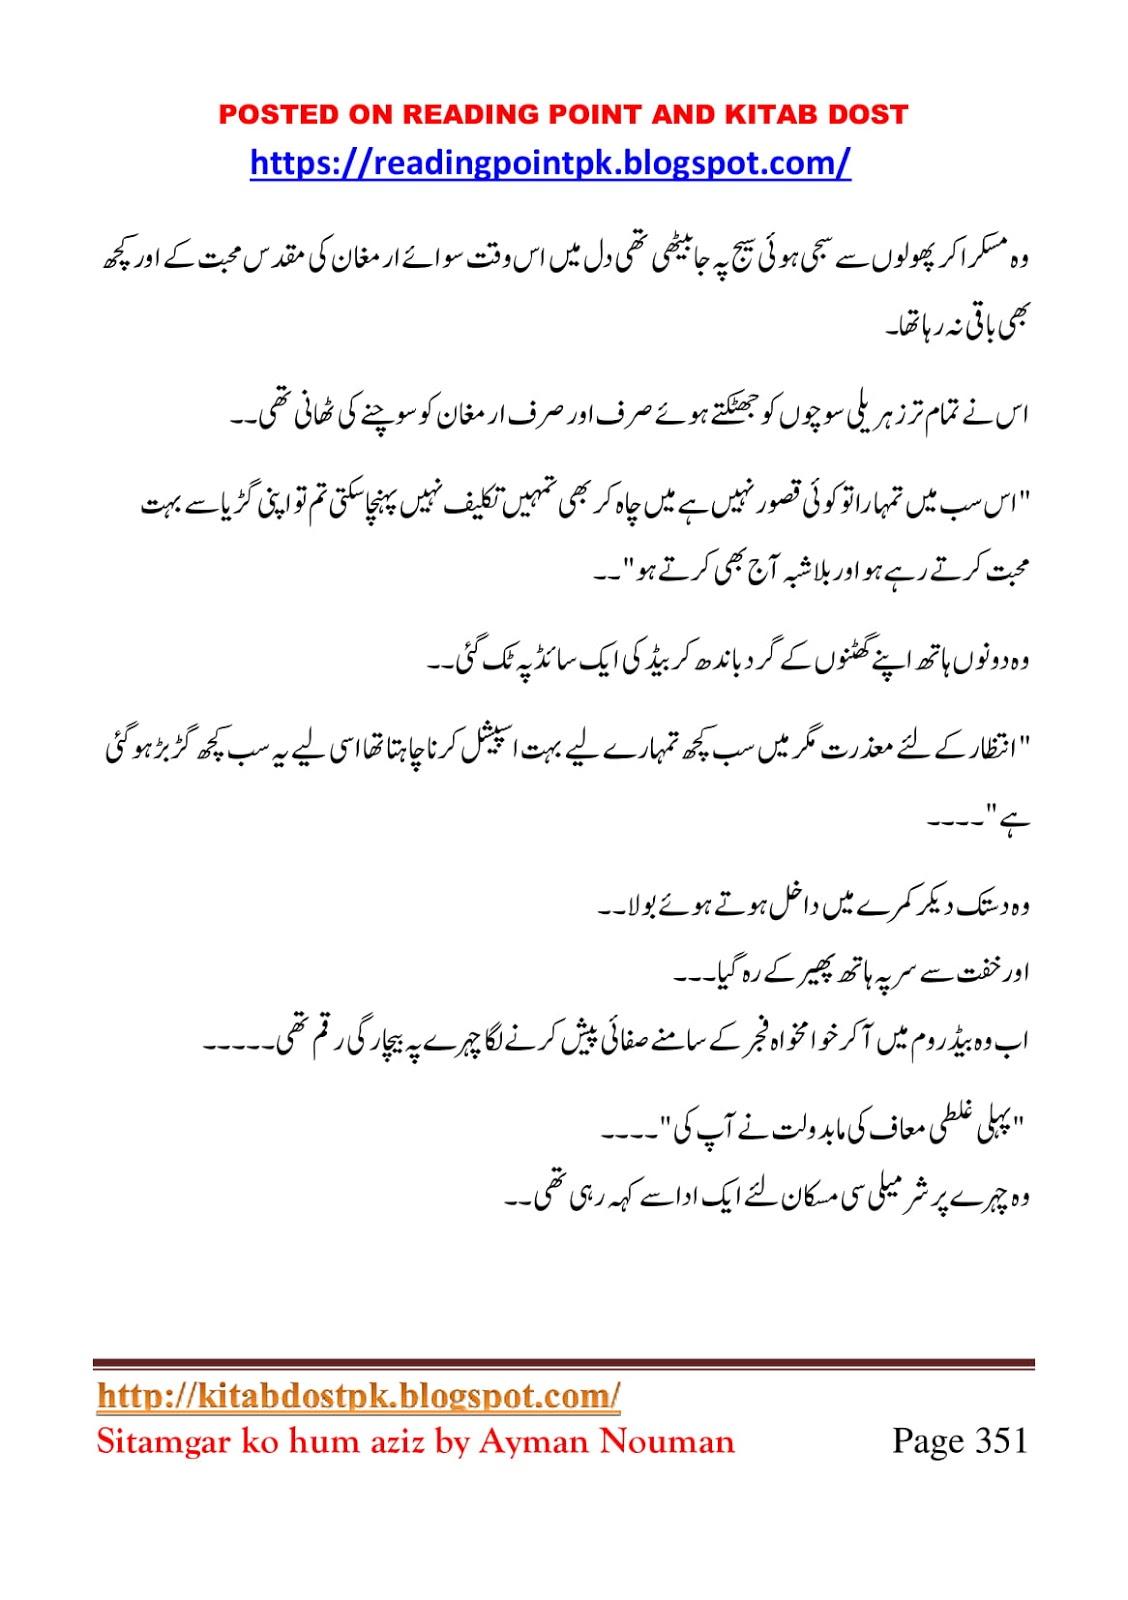 Sitamgar Ko Hum Aziz Part 2 by Ayman Nouman Urdu Novel Read Online